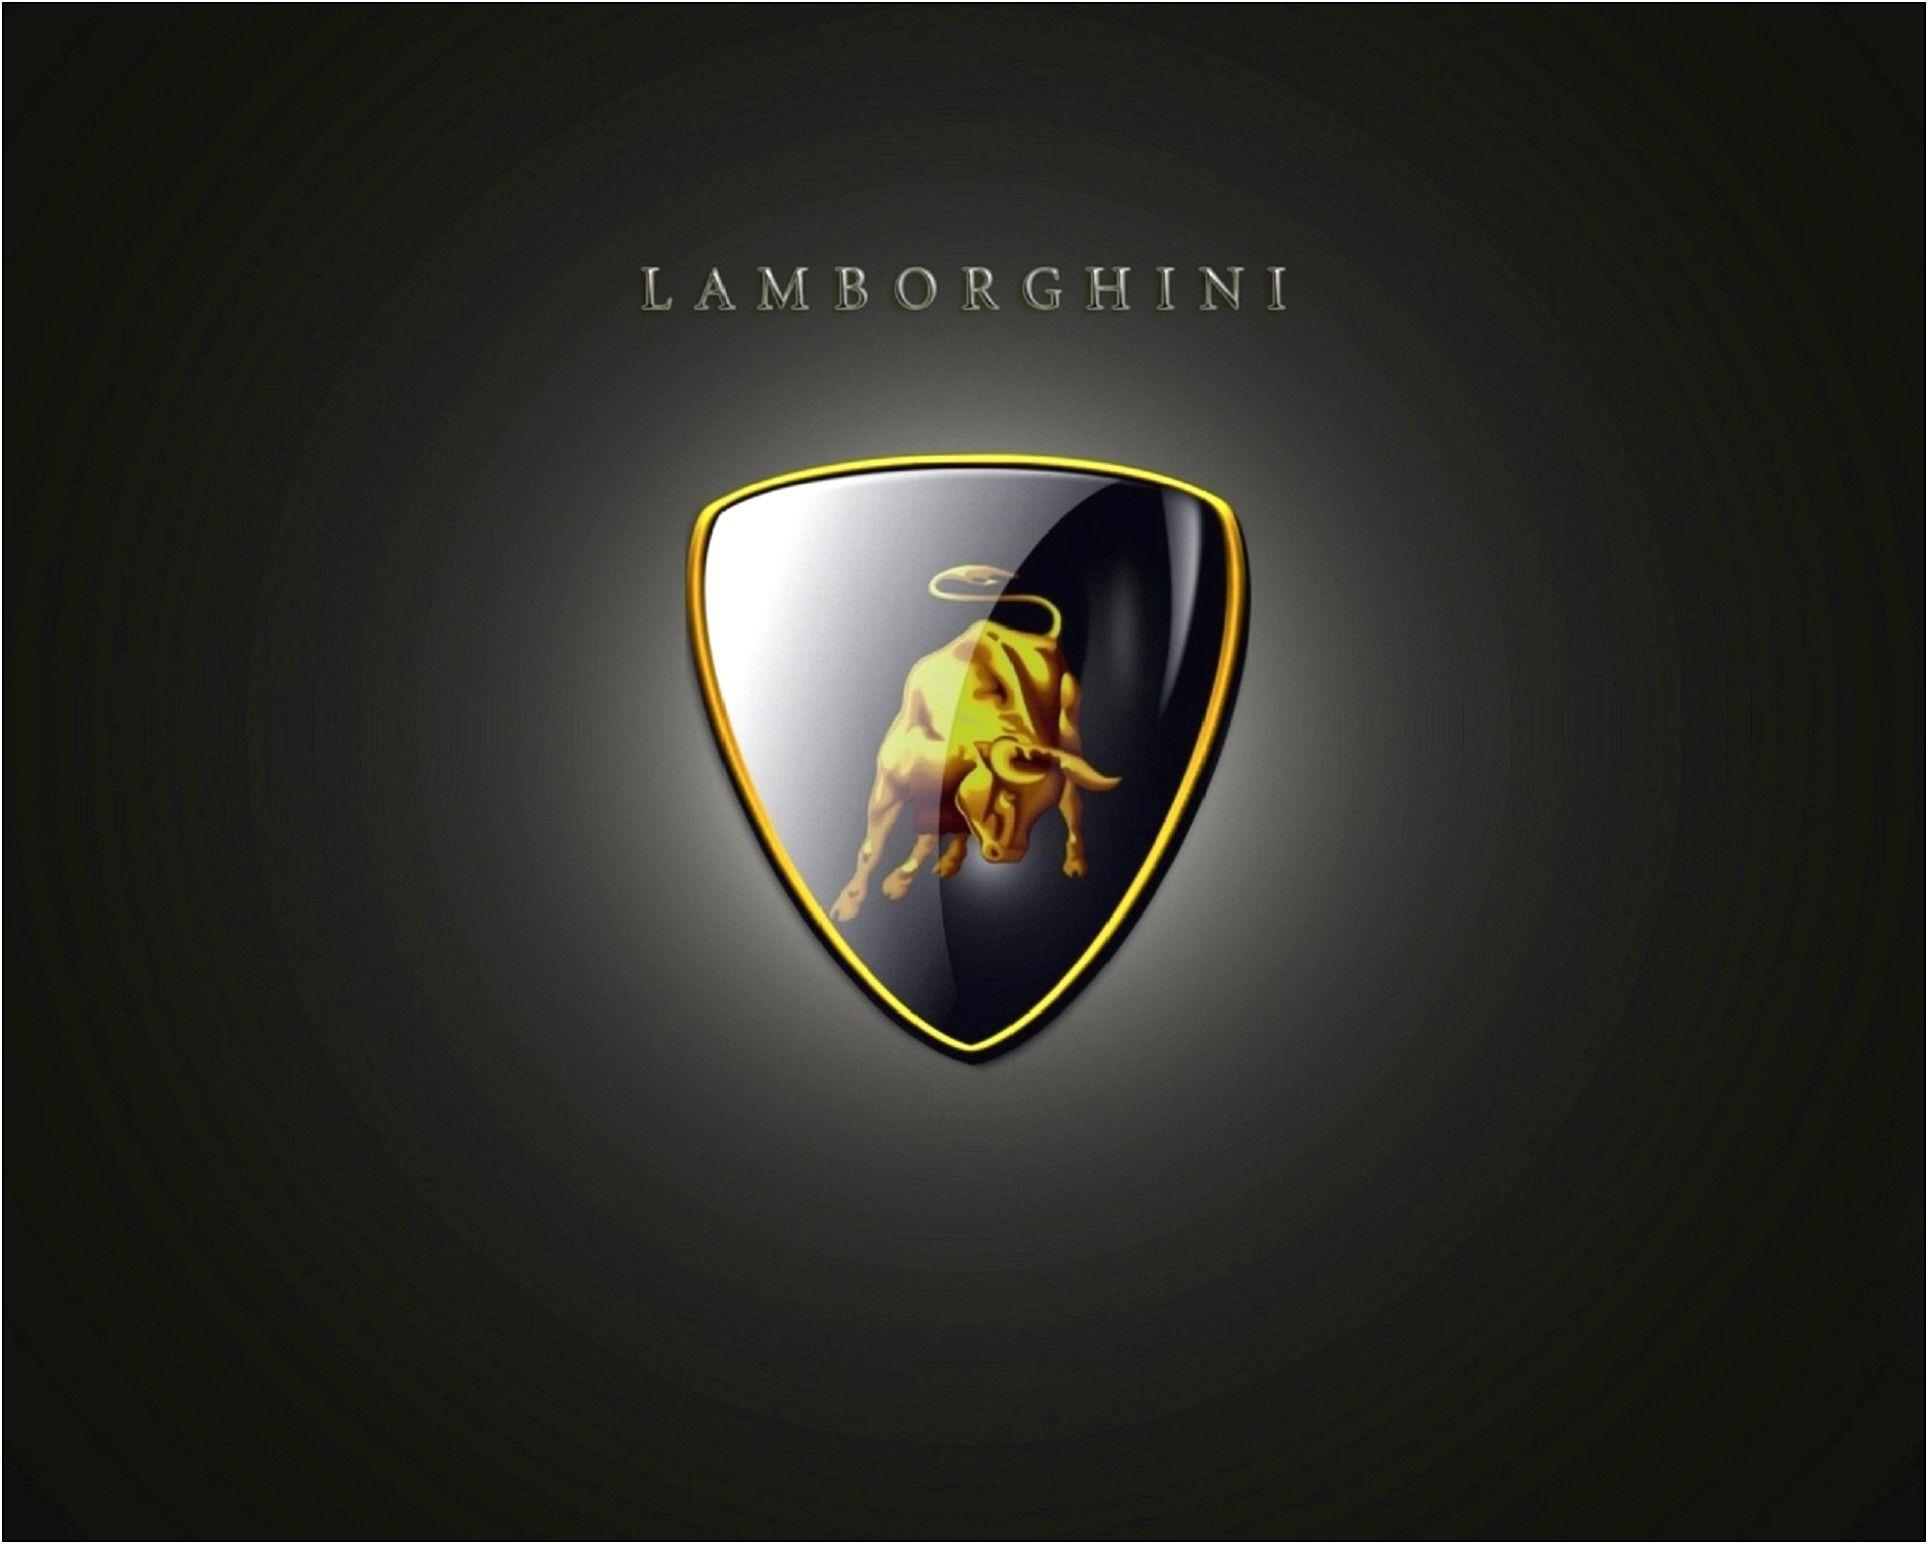 Lamborghini Wallpaper Desktop Background Http Www Justcontinentalcars Com Lamborghini Wallpaper Desktop Background